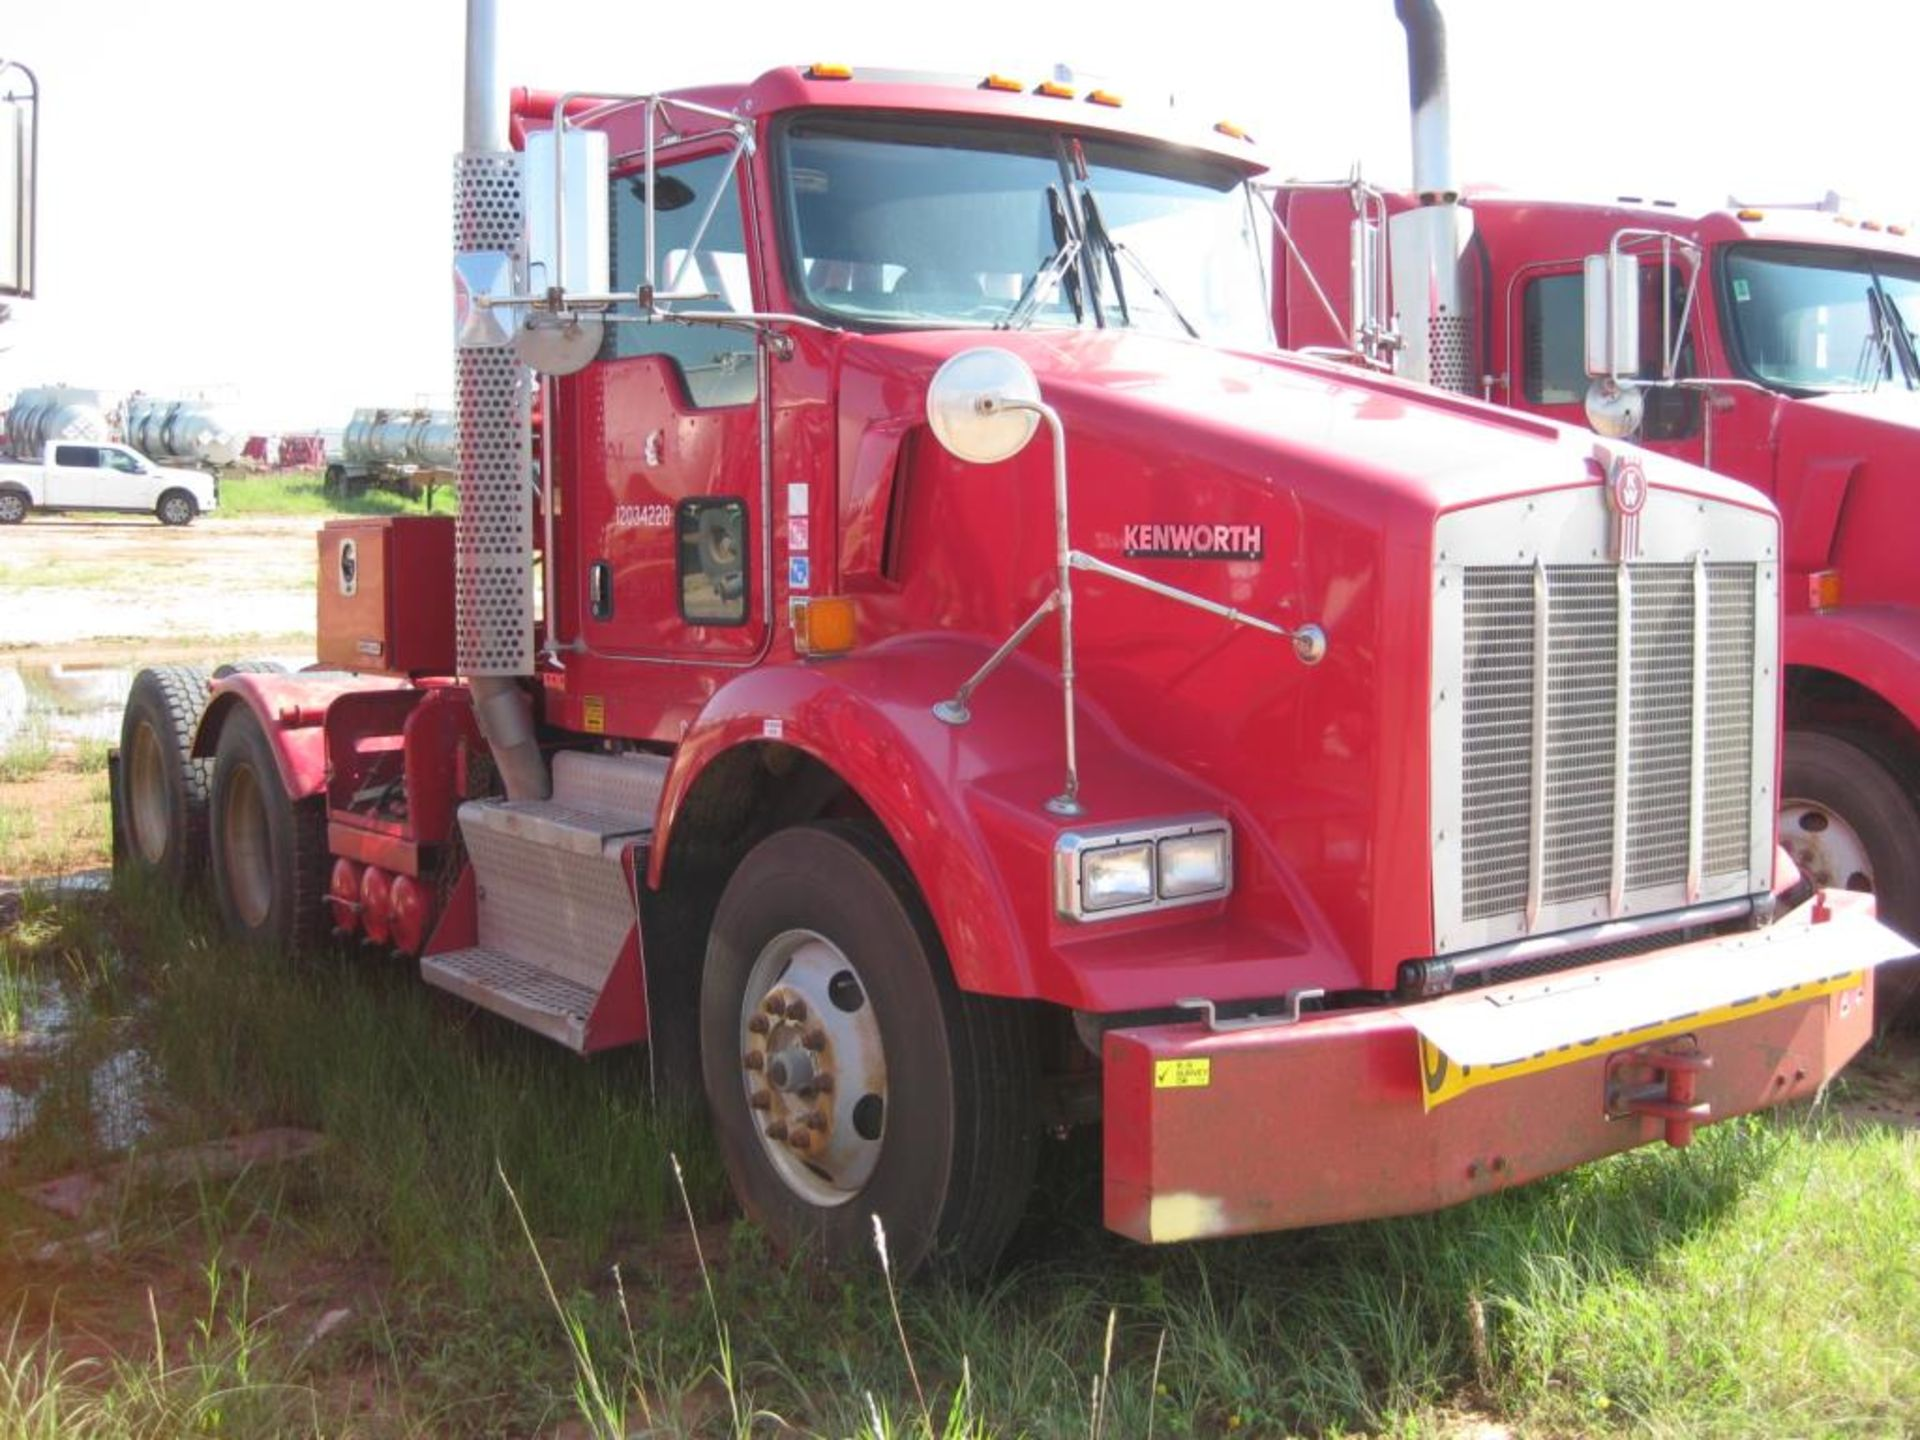 Kenworth Winch Truck - Image 2 of 25